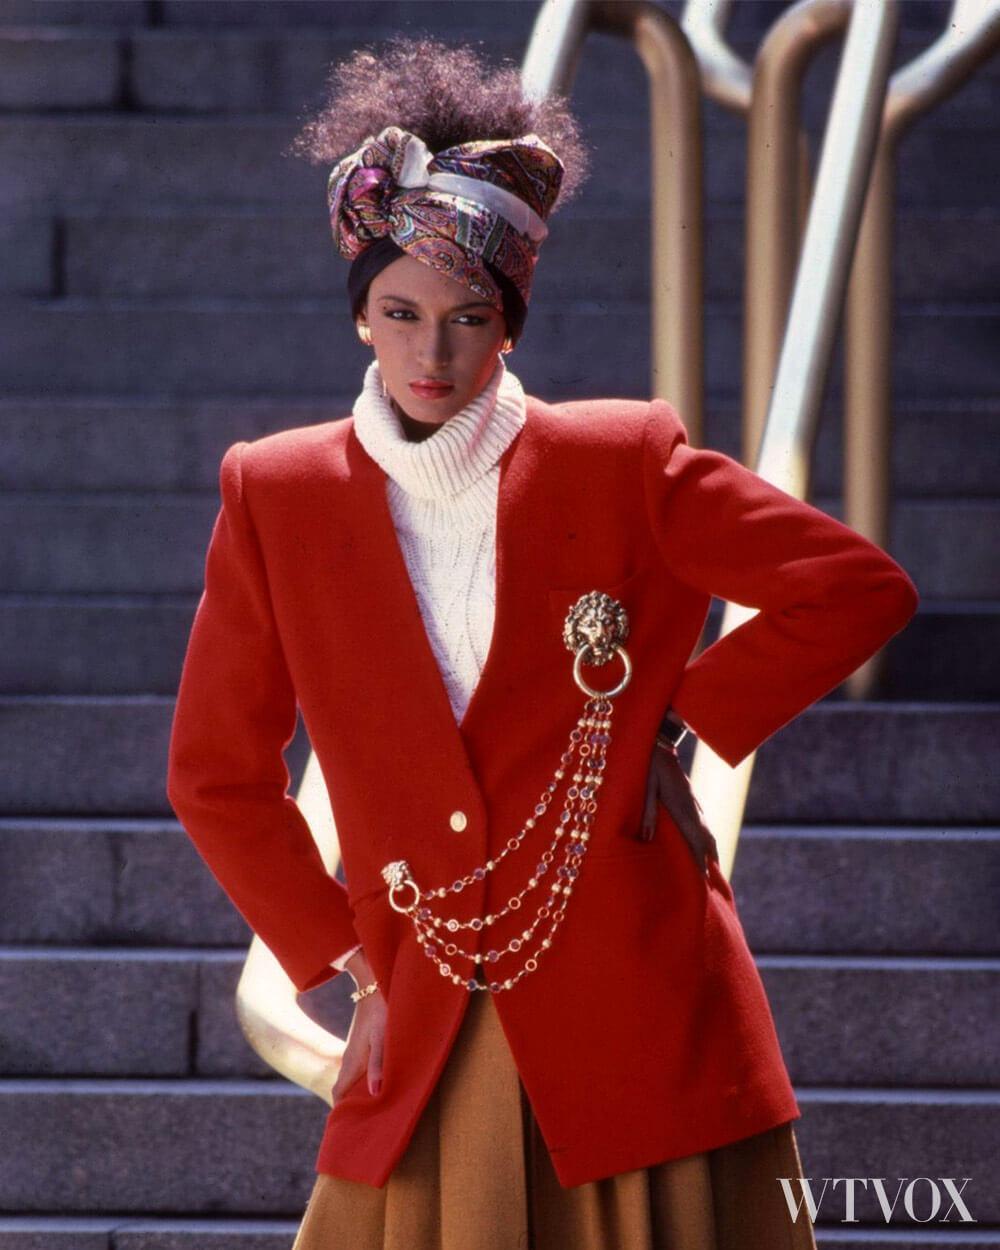 1980s vintage fashion